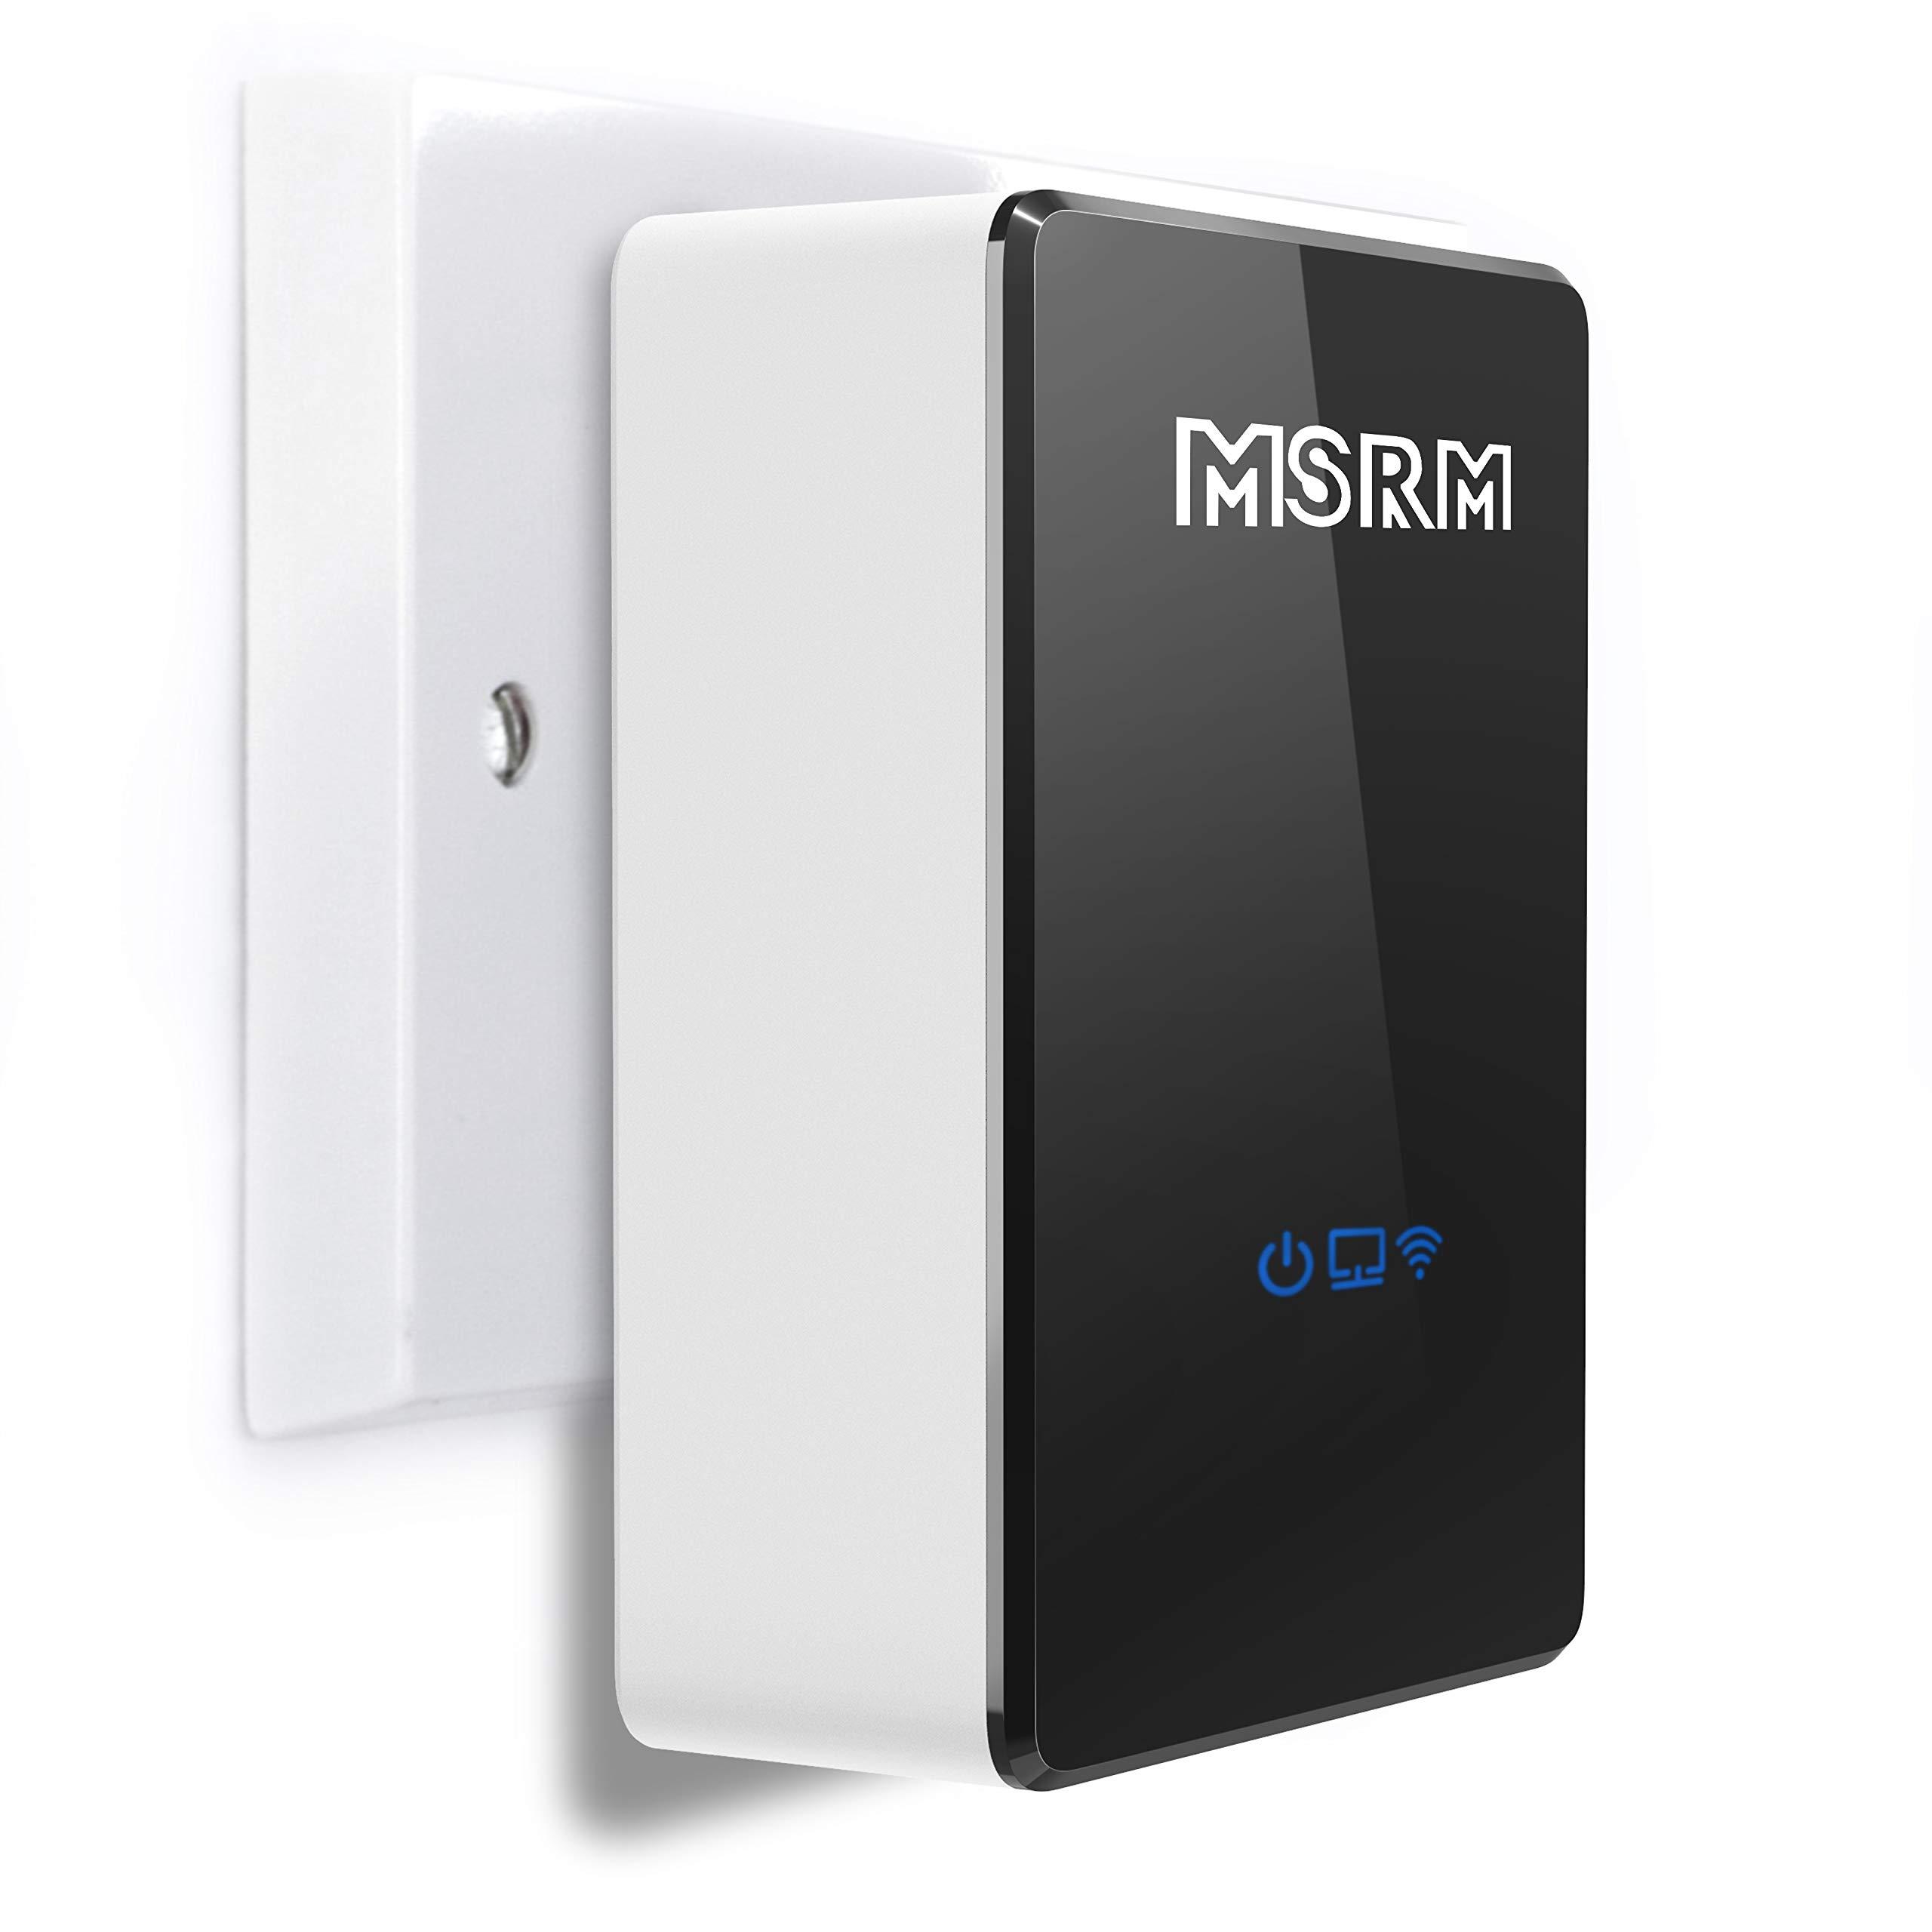 MSRM US300 300Mbps Wireless-N WiFi Range Extender, 802.11b/g/n WiFi Repeater 360 Degree Covering